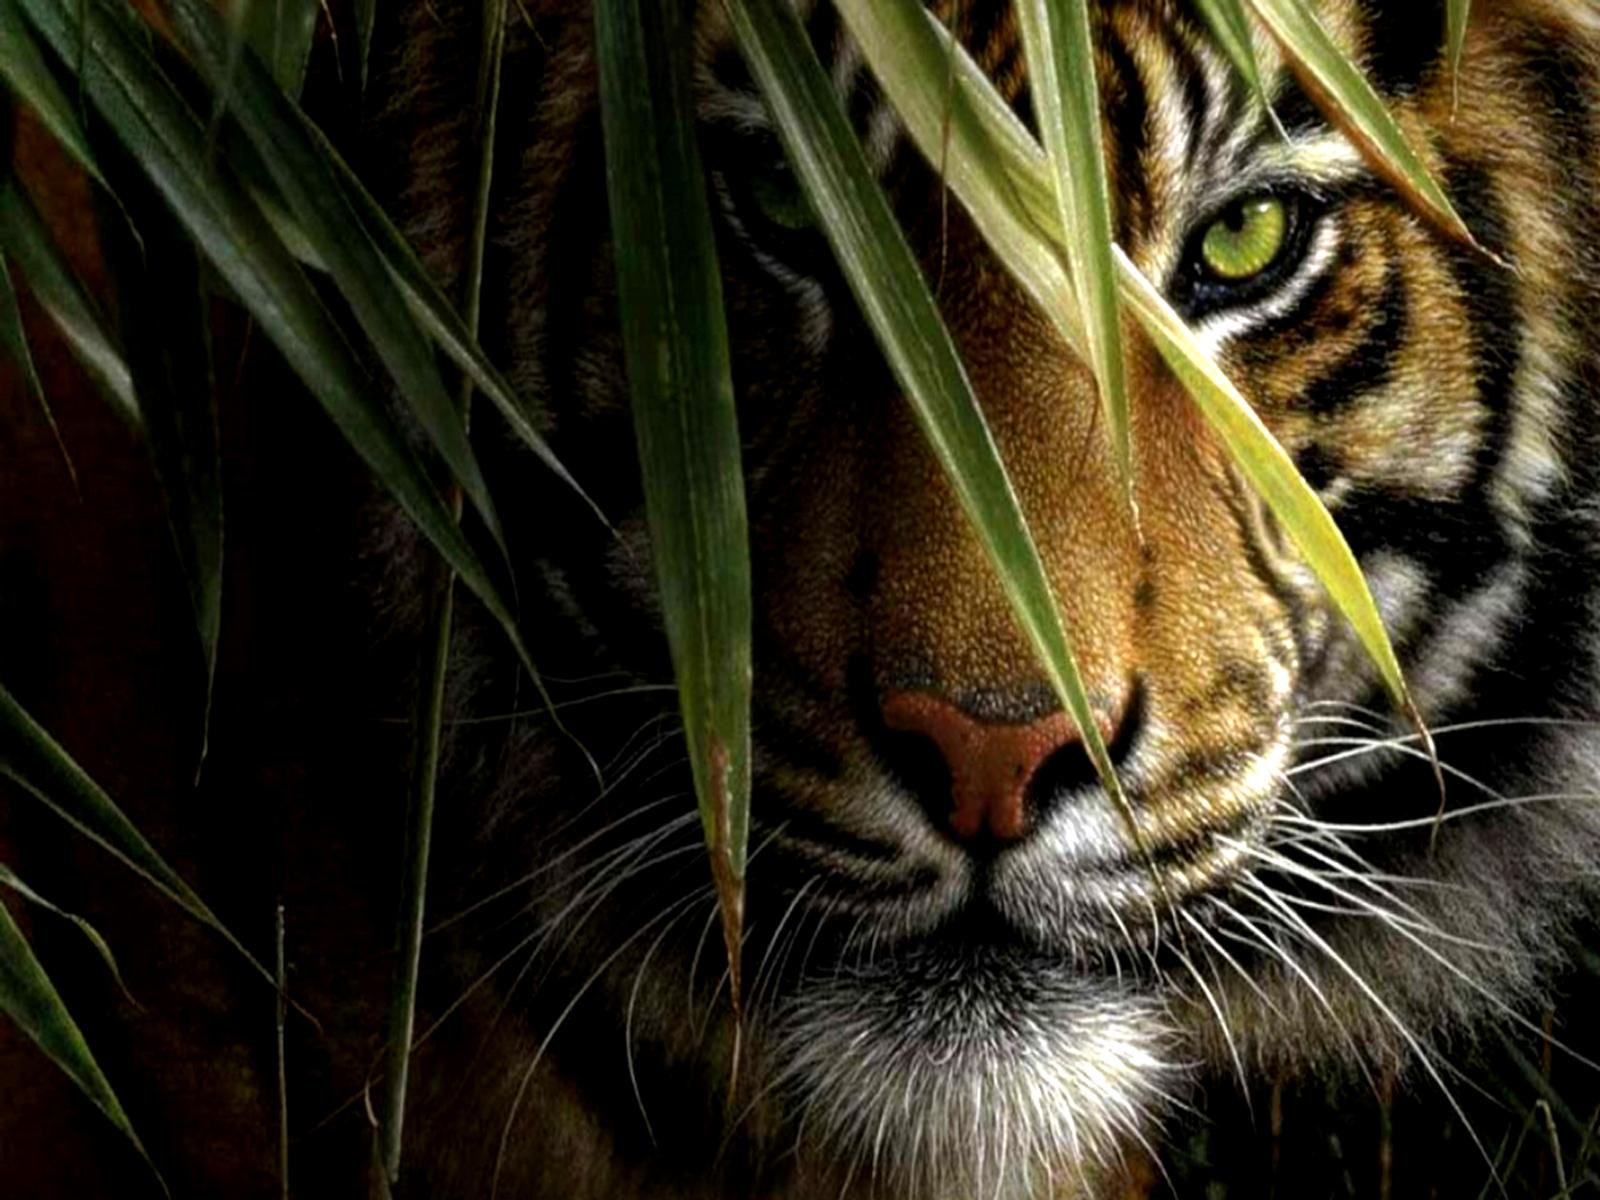 crouching tiger art - id: 28120 - art abyss